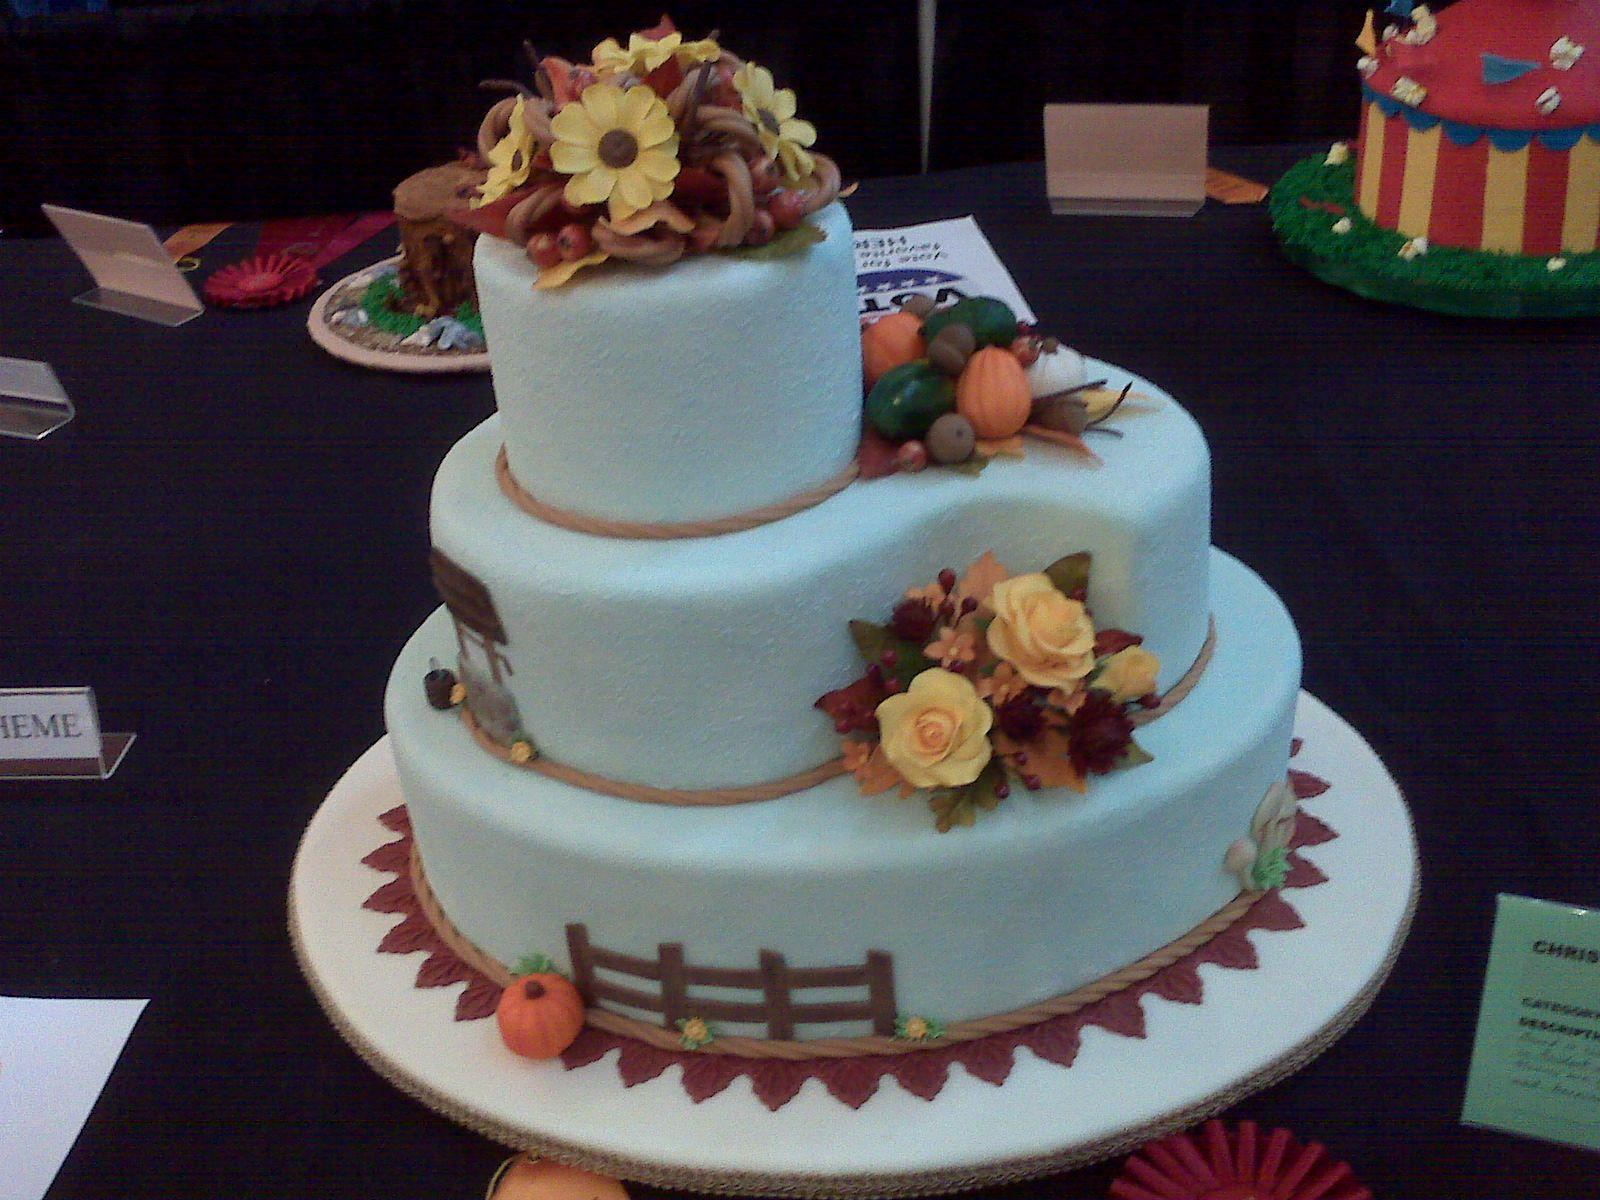 Fondant Cakes Fondant Cake Decorating Ideas At Circle Of Food - Healthy Wedding Cakes